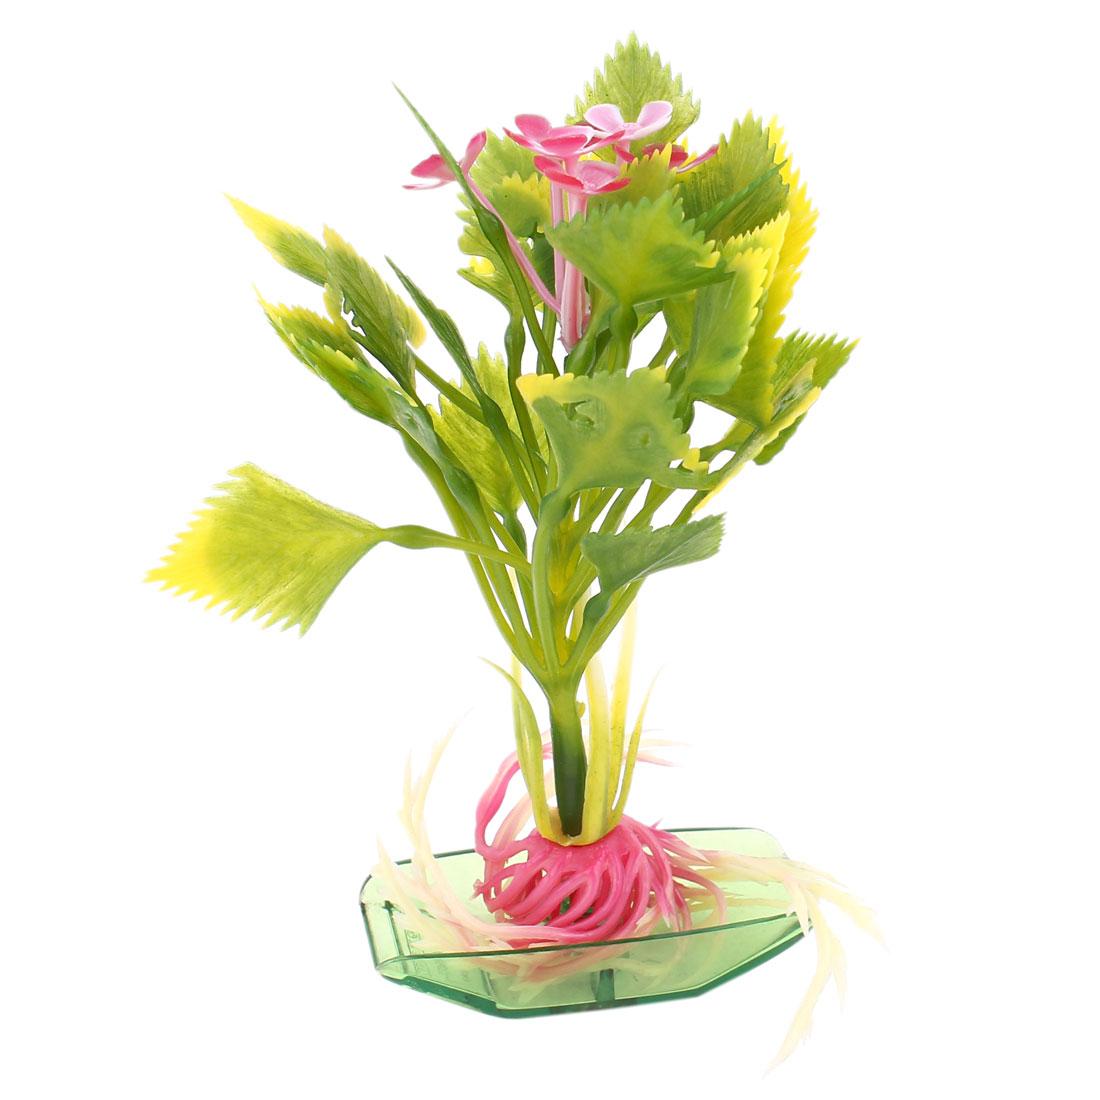 "5.1"" Height Green Aquarium Ornament Plastic Aquatic Grass Plant Flower Detailing"